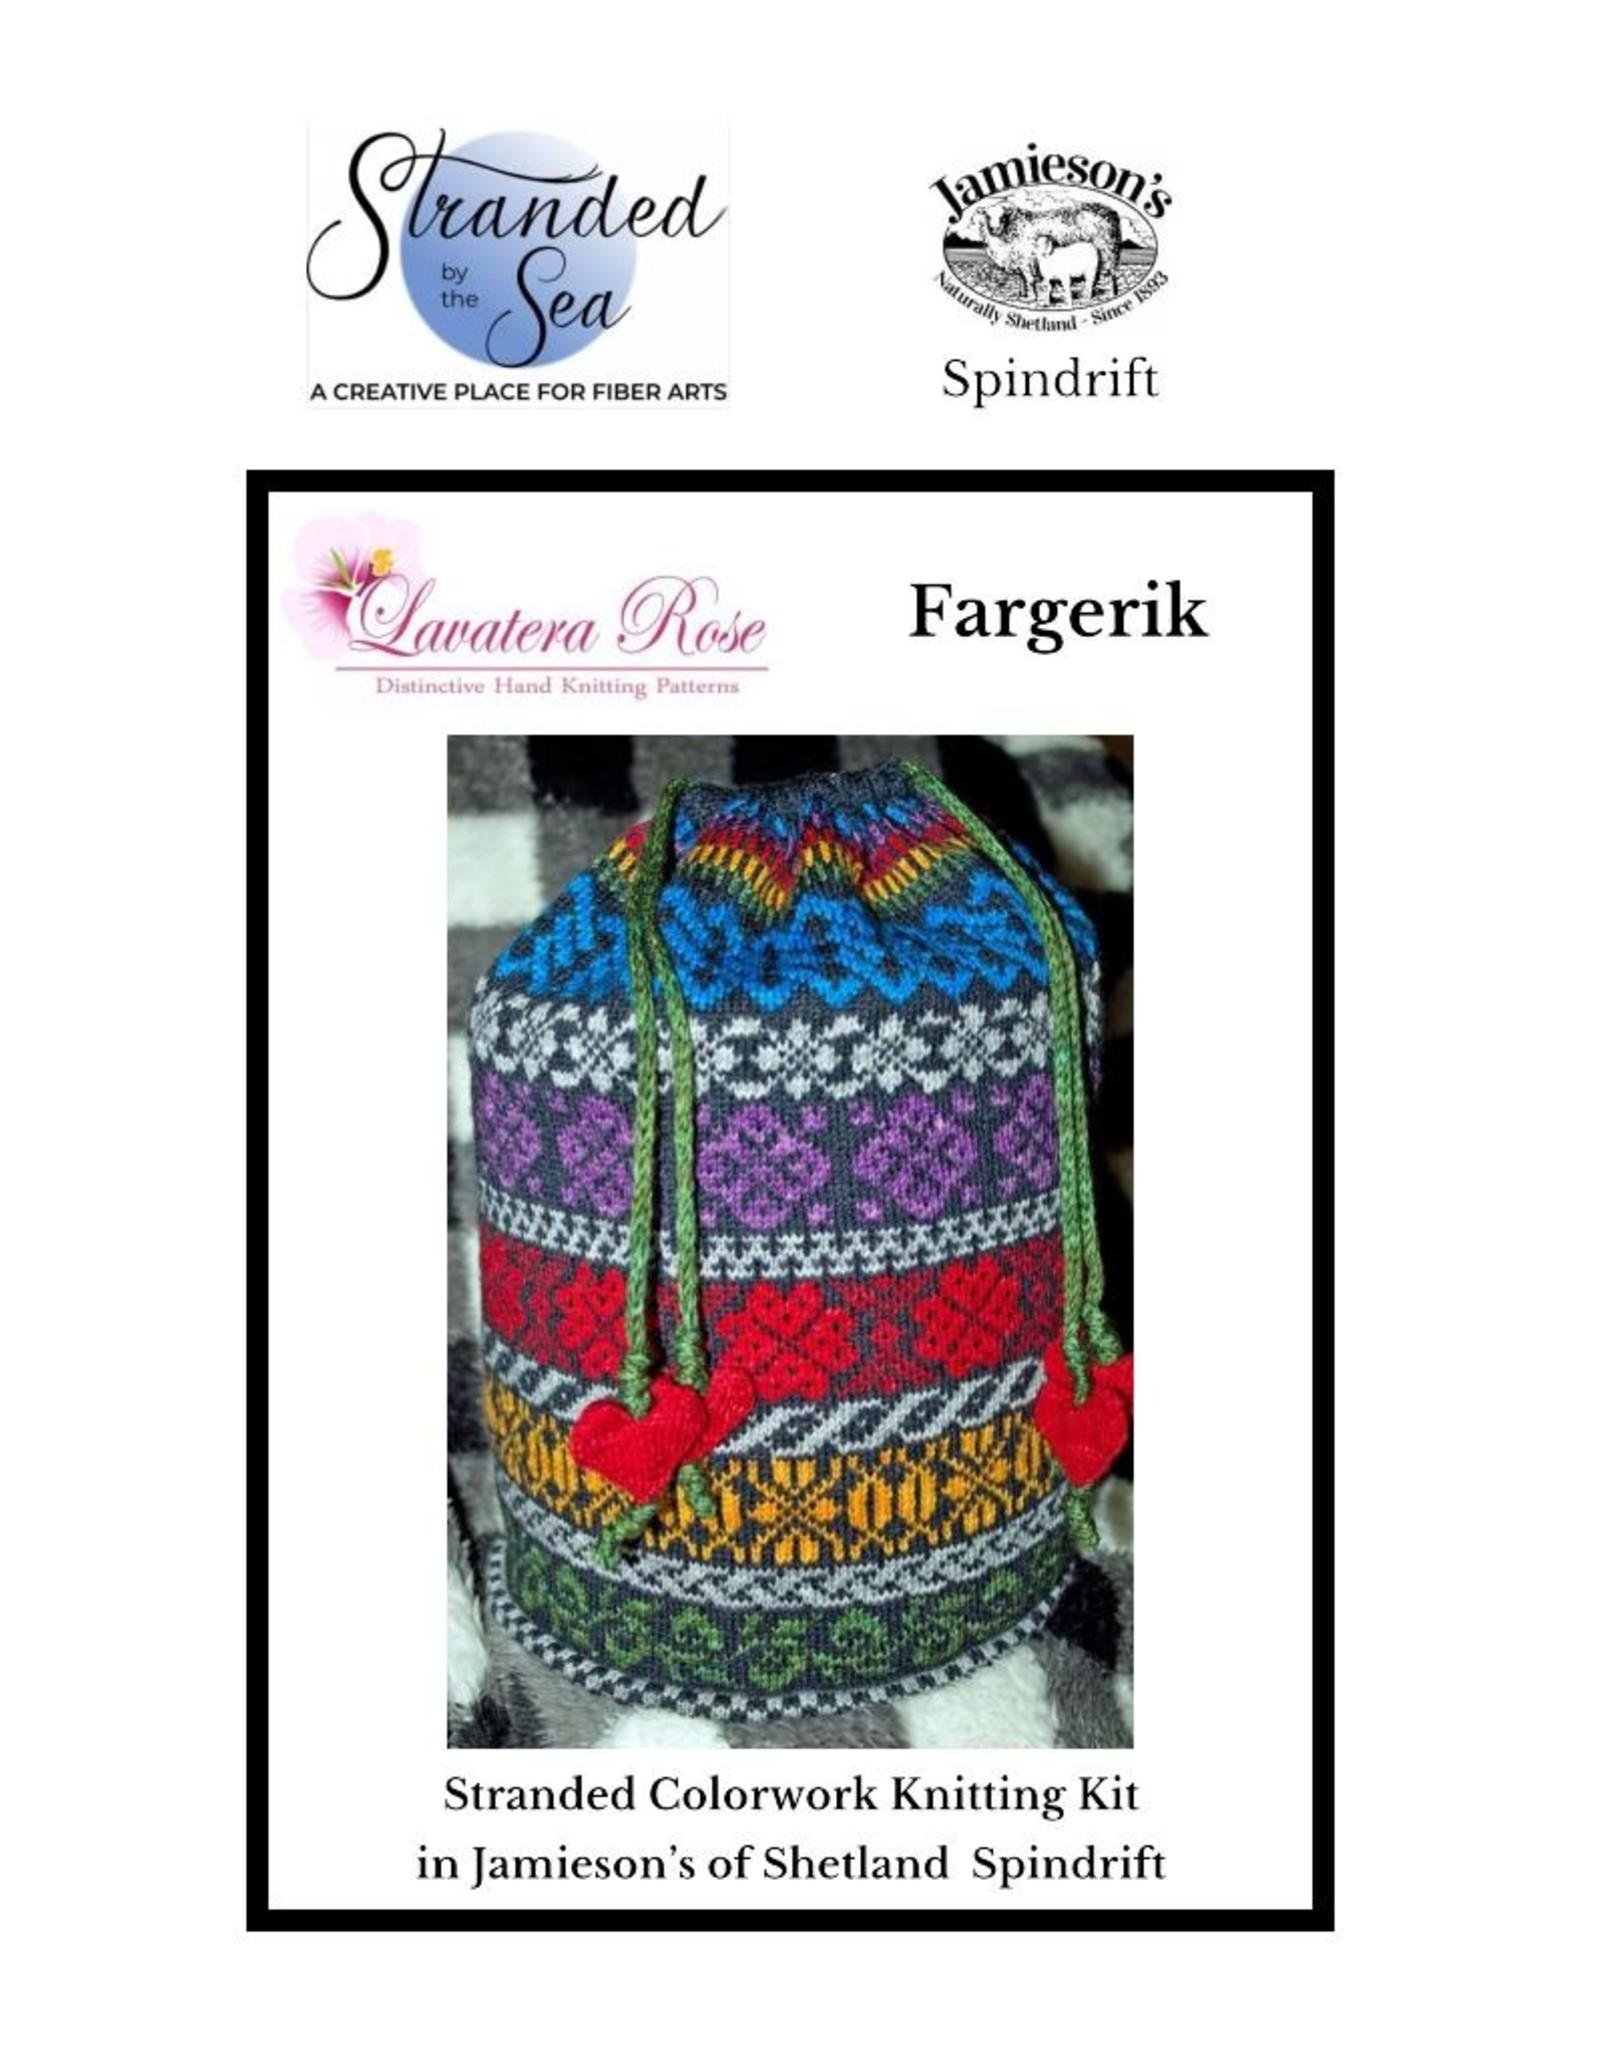 Stranded by the Sea Fargerik Colorwork Knitting Kit in Spindrift